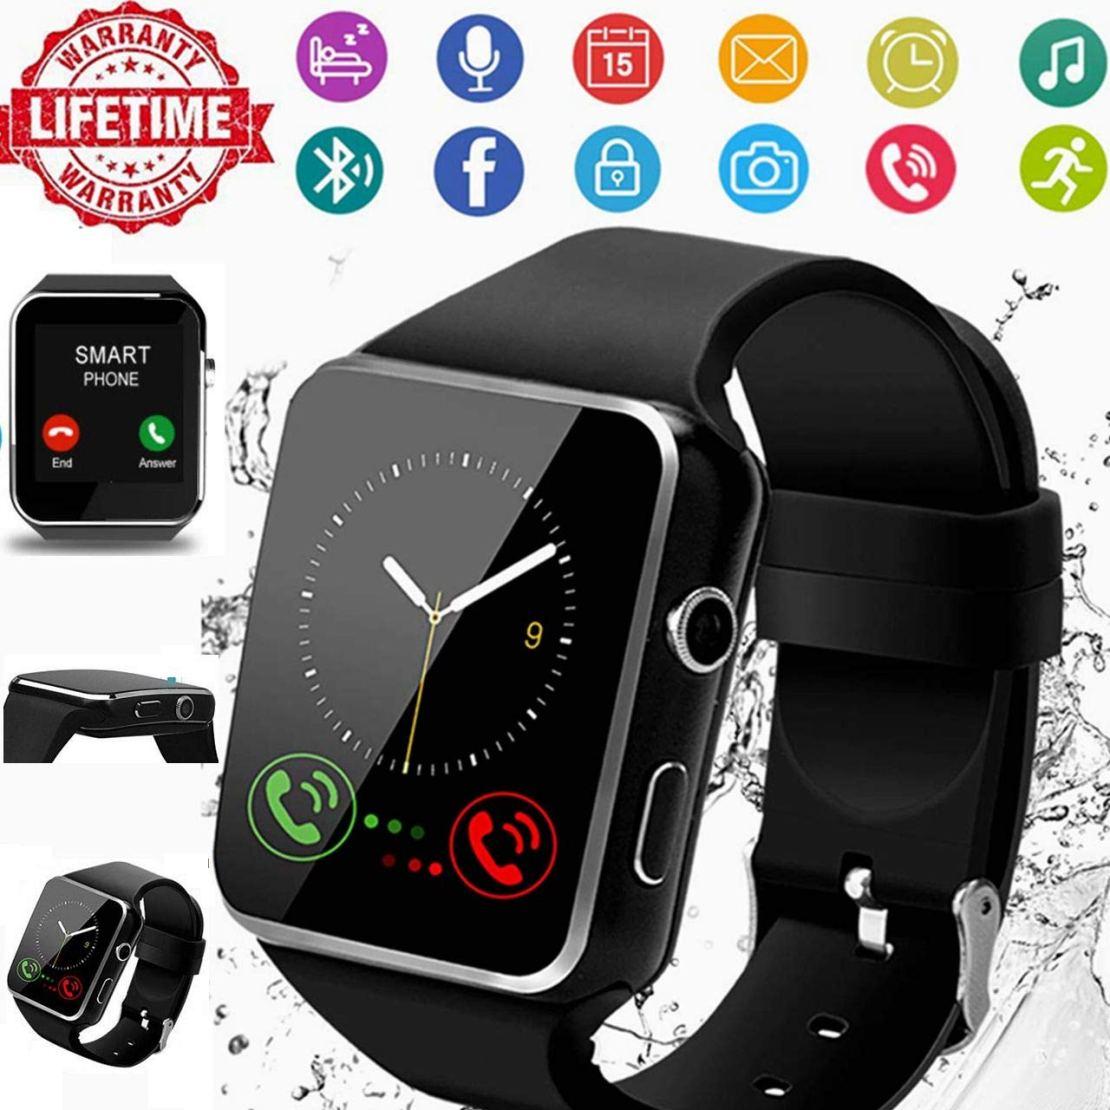 71UreuOKjzL. SL1280  - 10 Best Smartwatches 2019